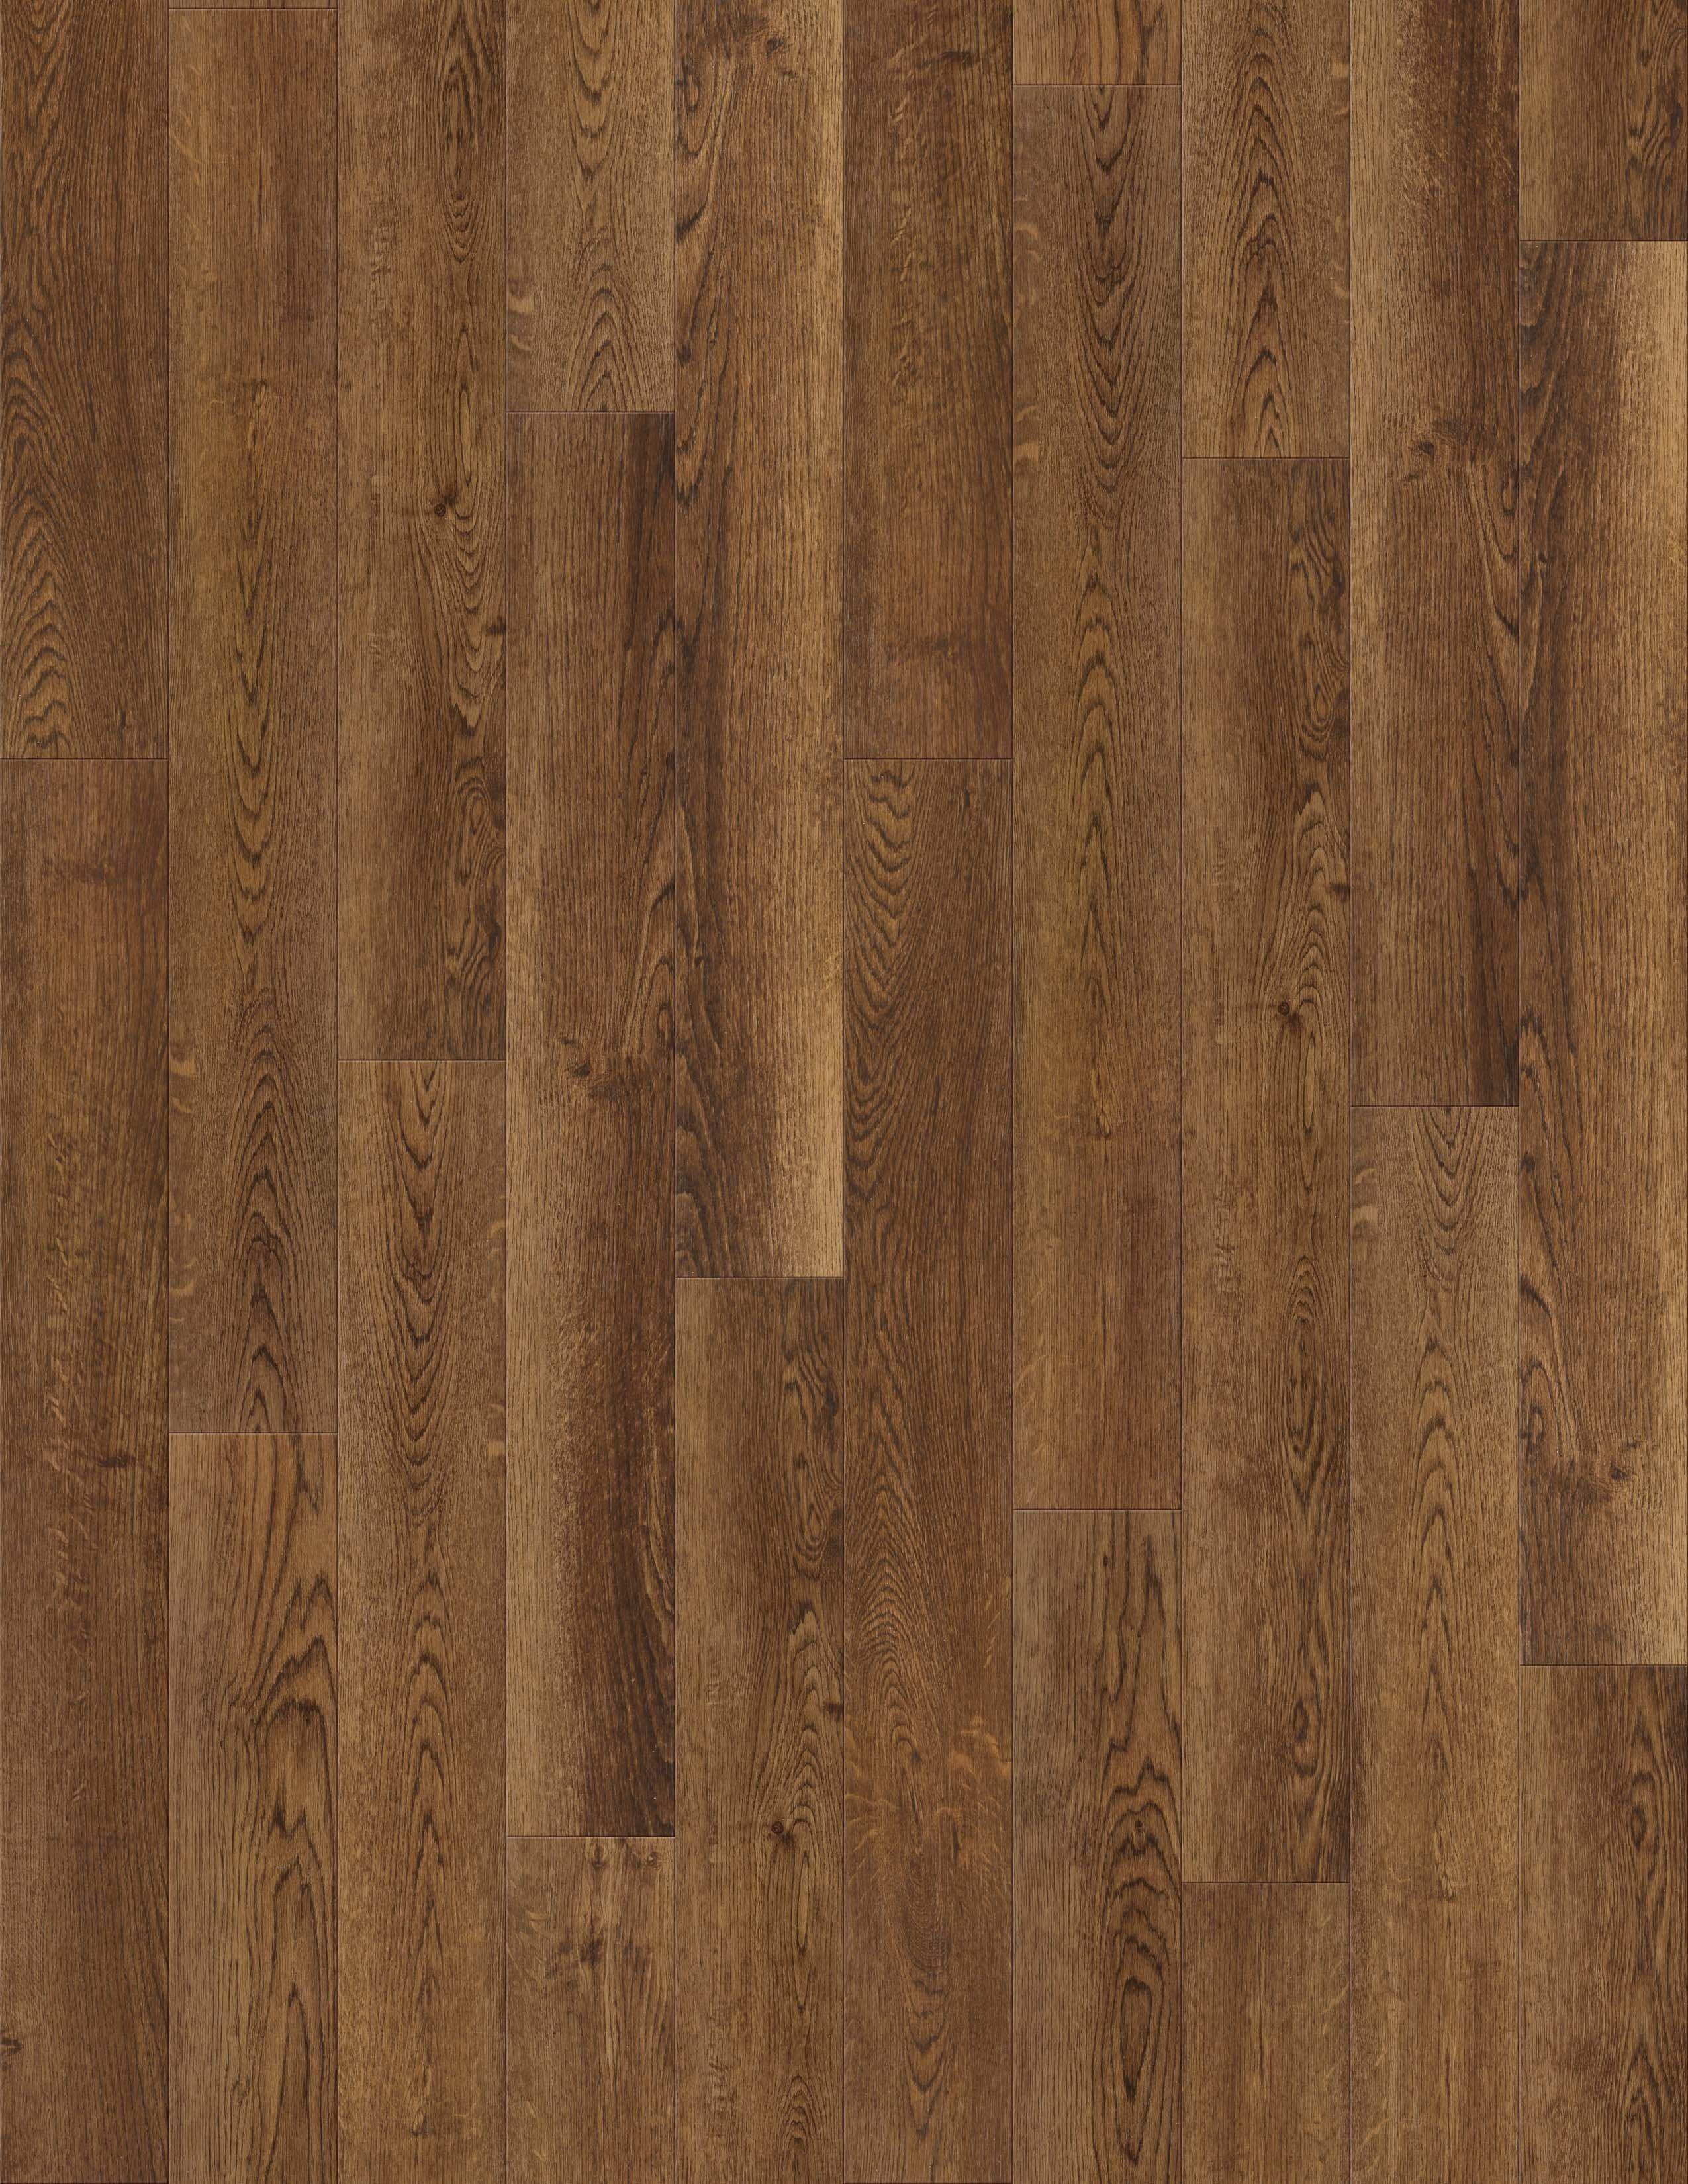 Lexington Oak Sample Flooring Hardwood Floors Vinyl Flooring